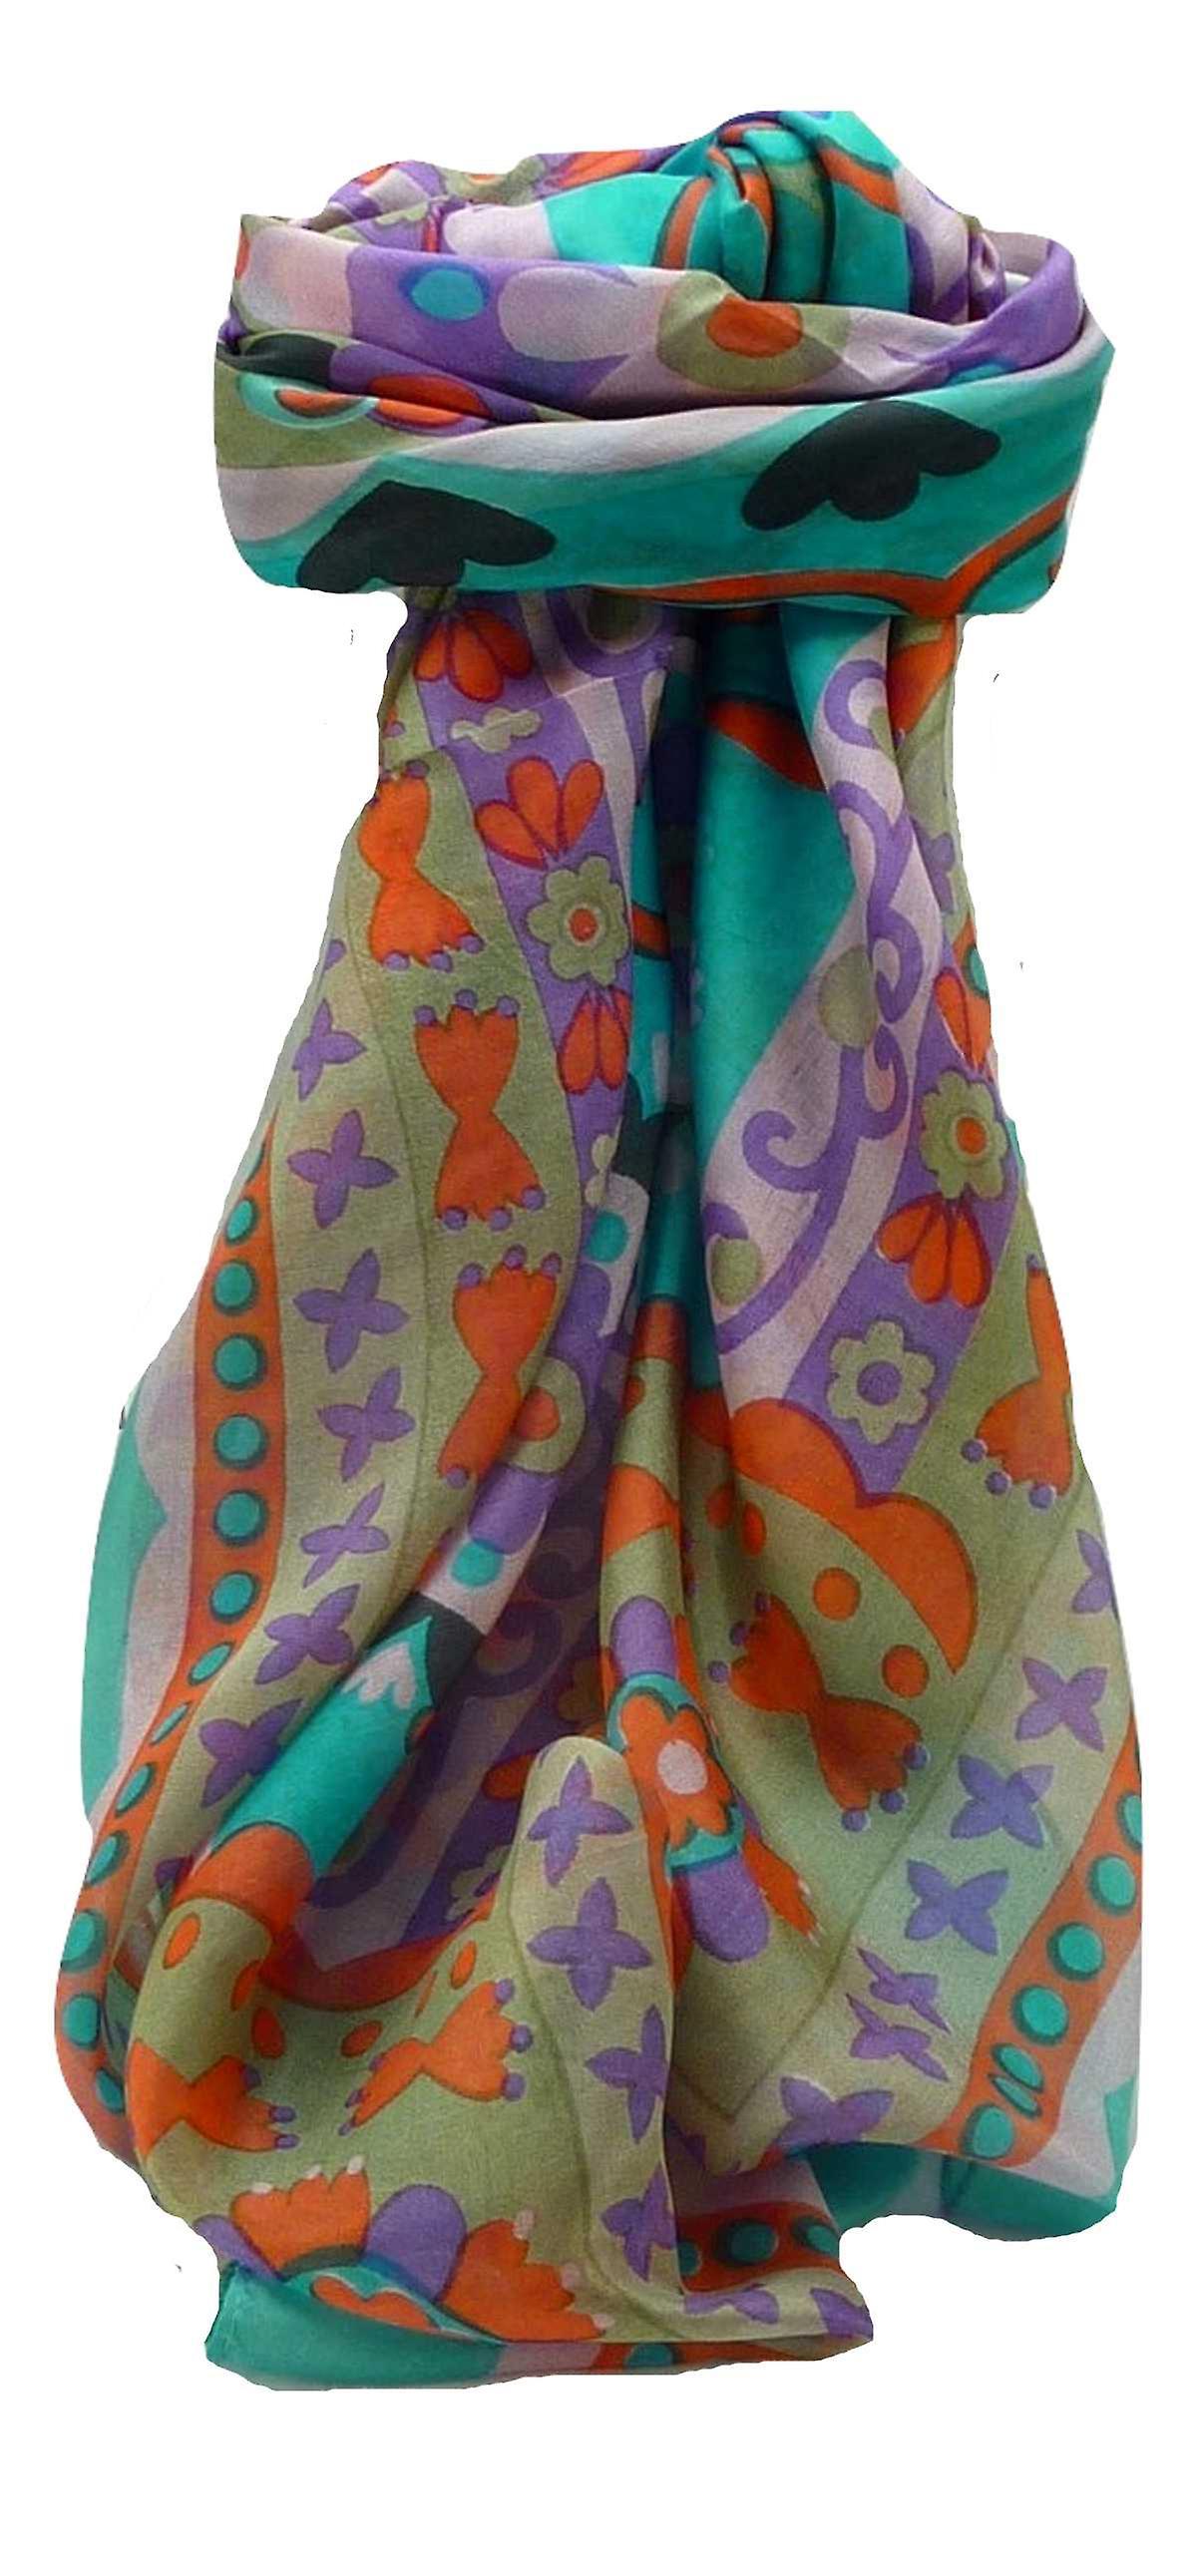 Mulberry Silk Contemporary Square Scarf Geometric G120 by Pashmina & Silk